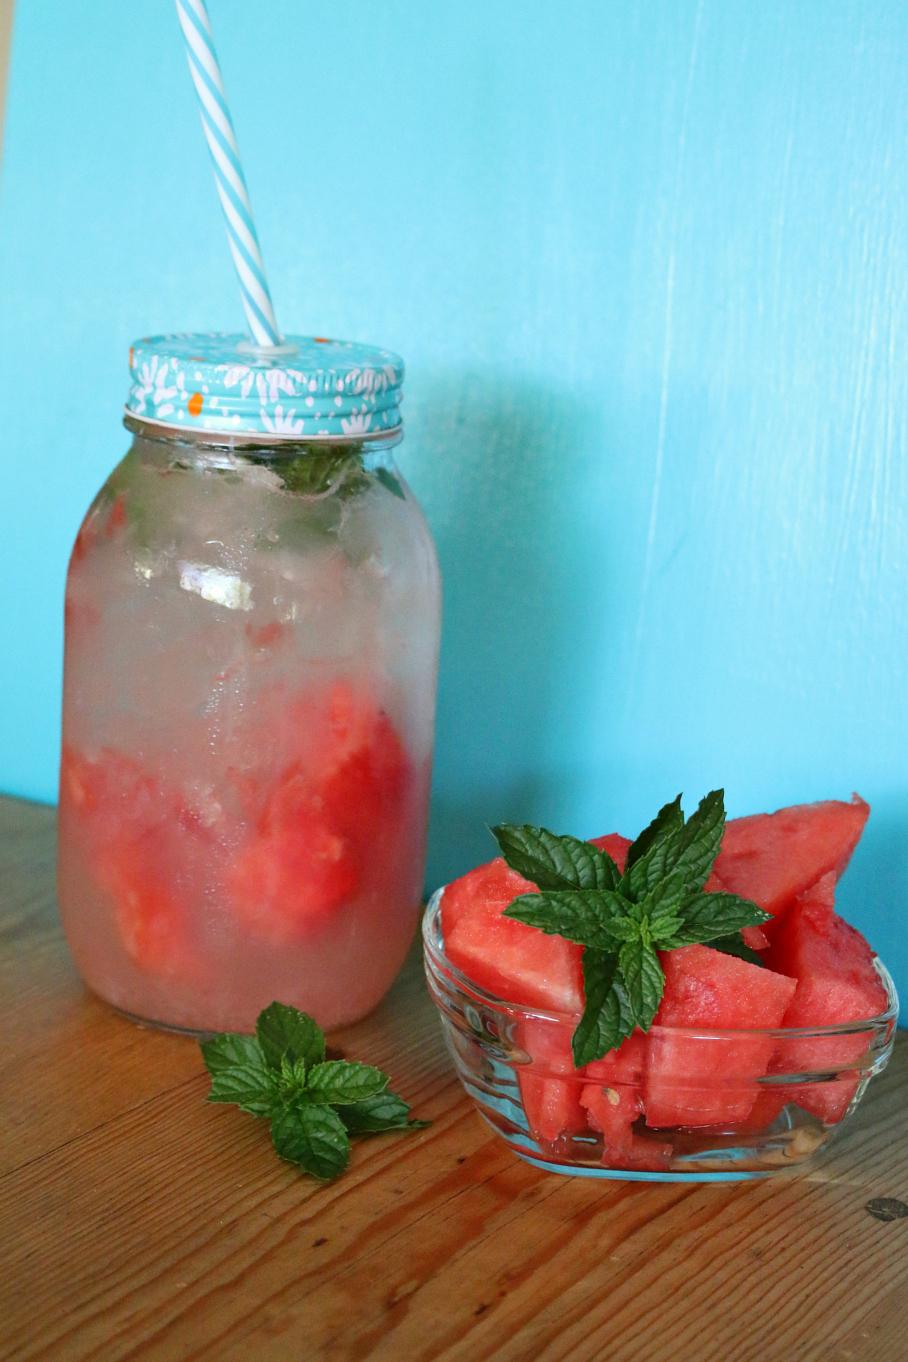 Watermelon Mint Aqua Fresca CeceliasGoodStuff.com Good Food for Good Peole